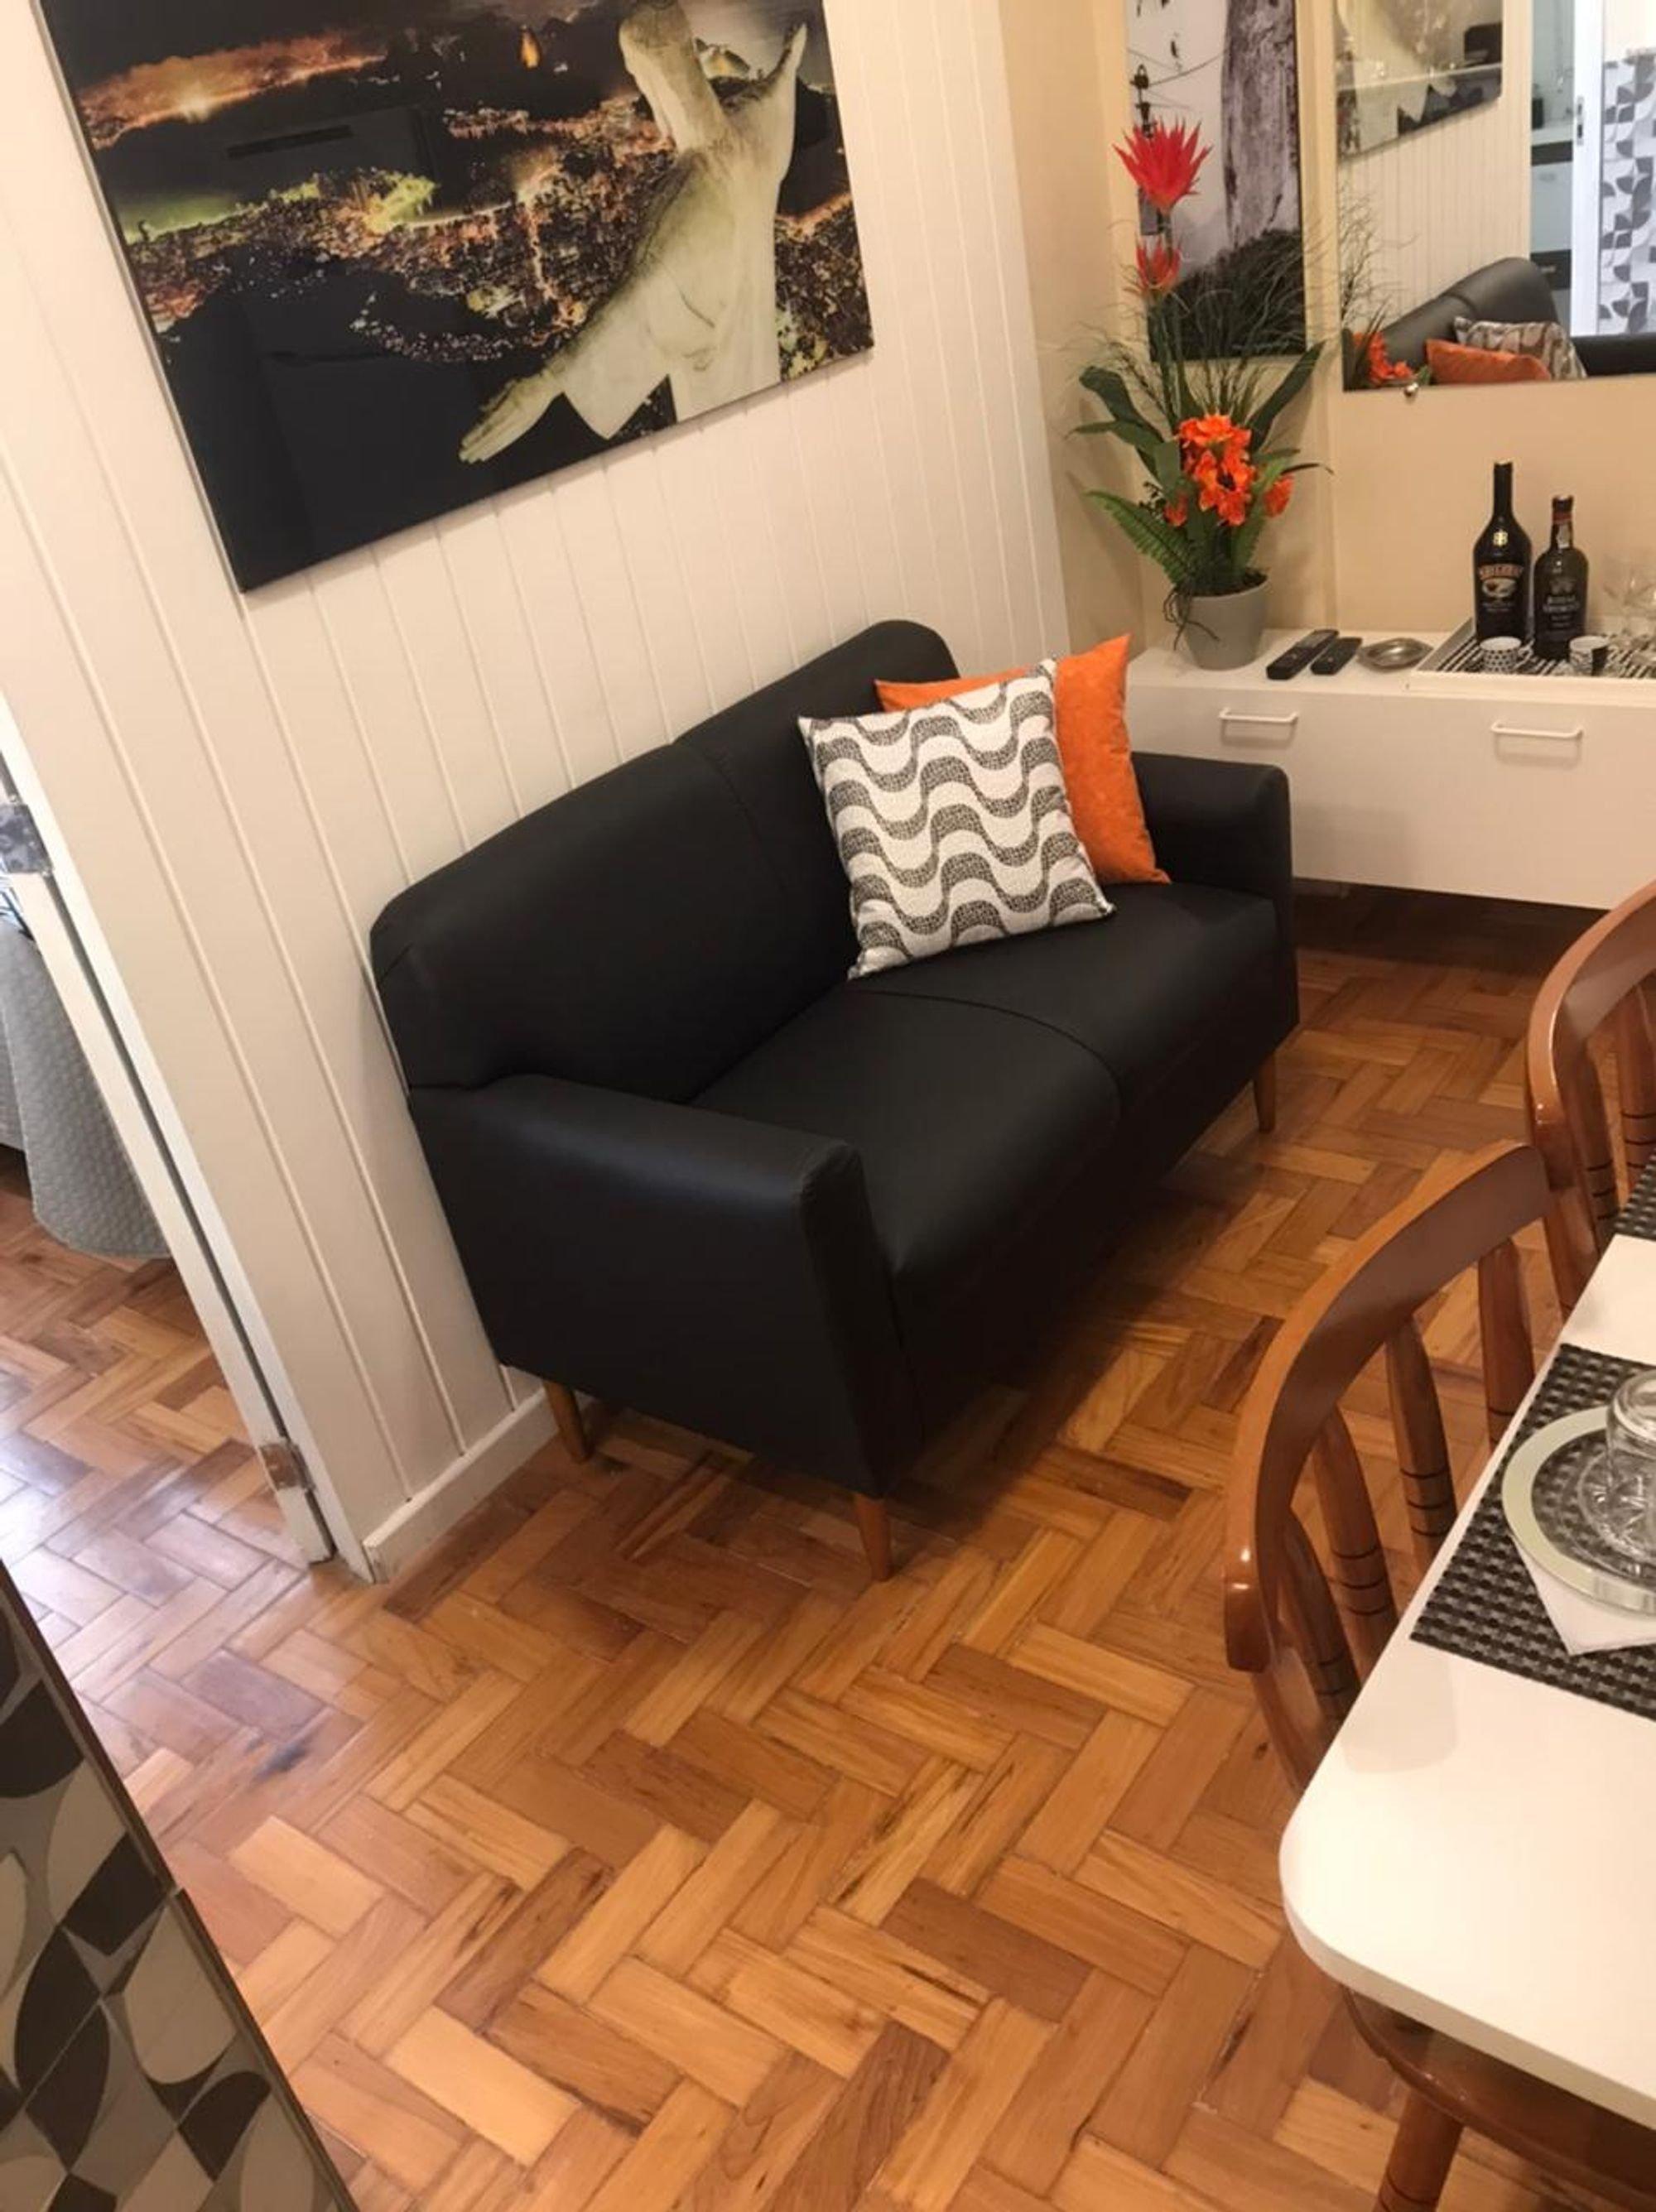 Foto de Sala com vaso de planta, sofá, vaso, garrafa, cadeira, mesa de jantar